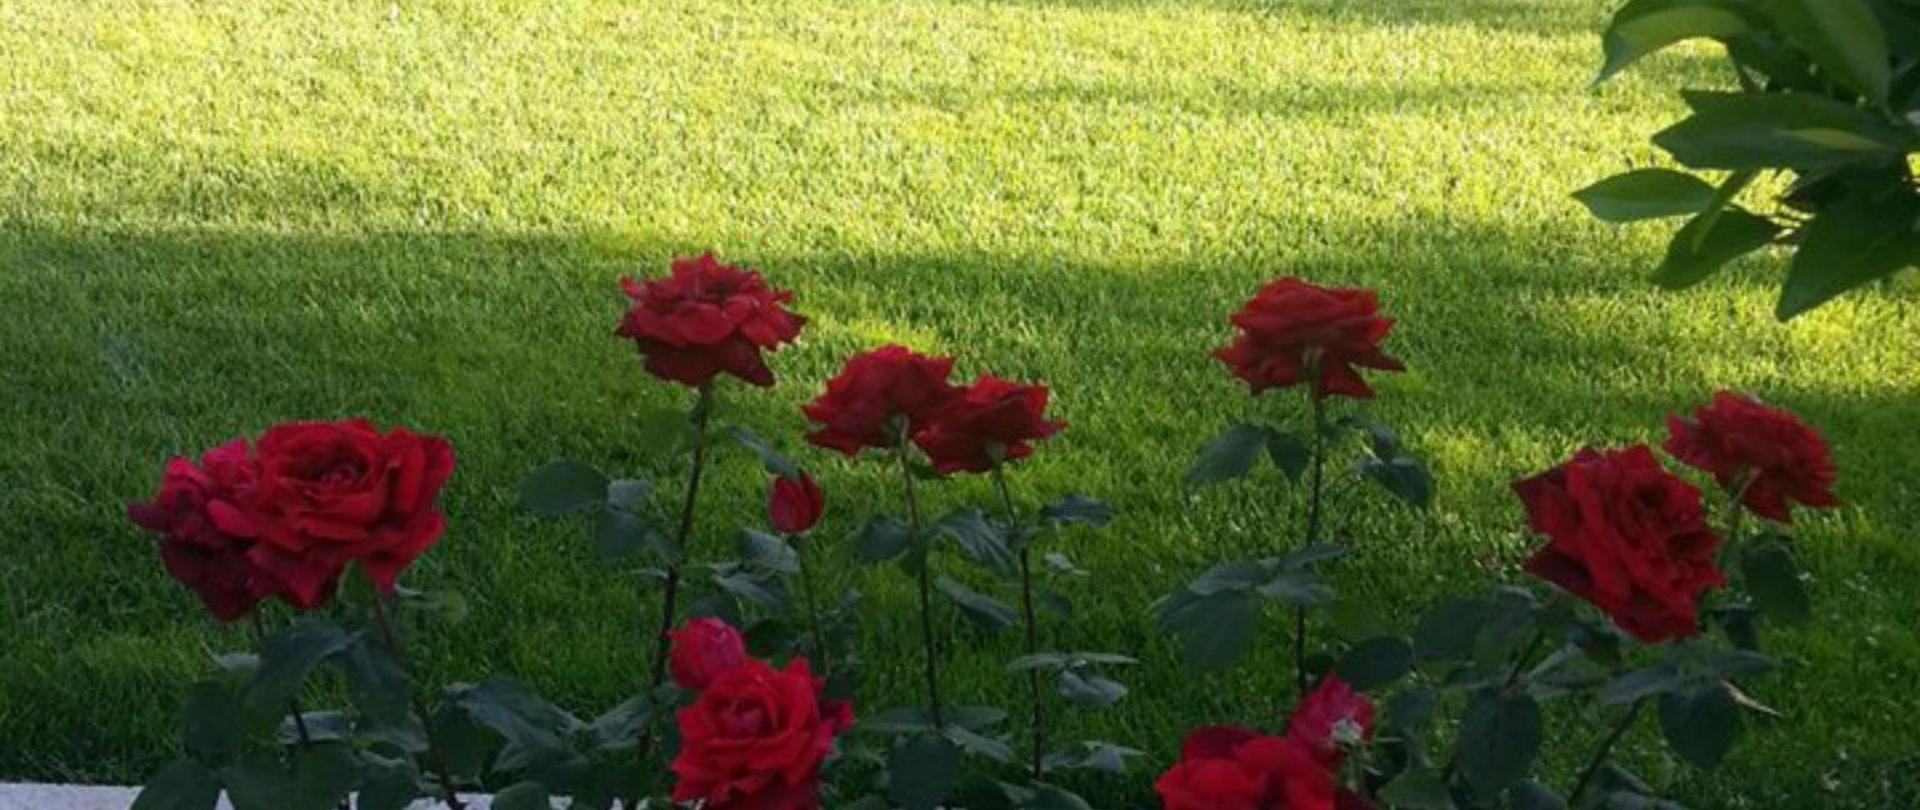 jardin1g.jpg